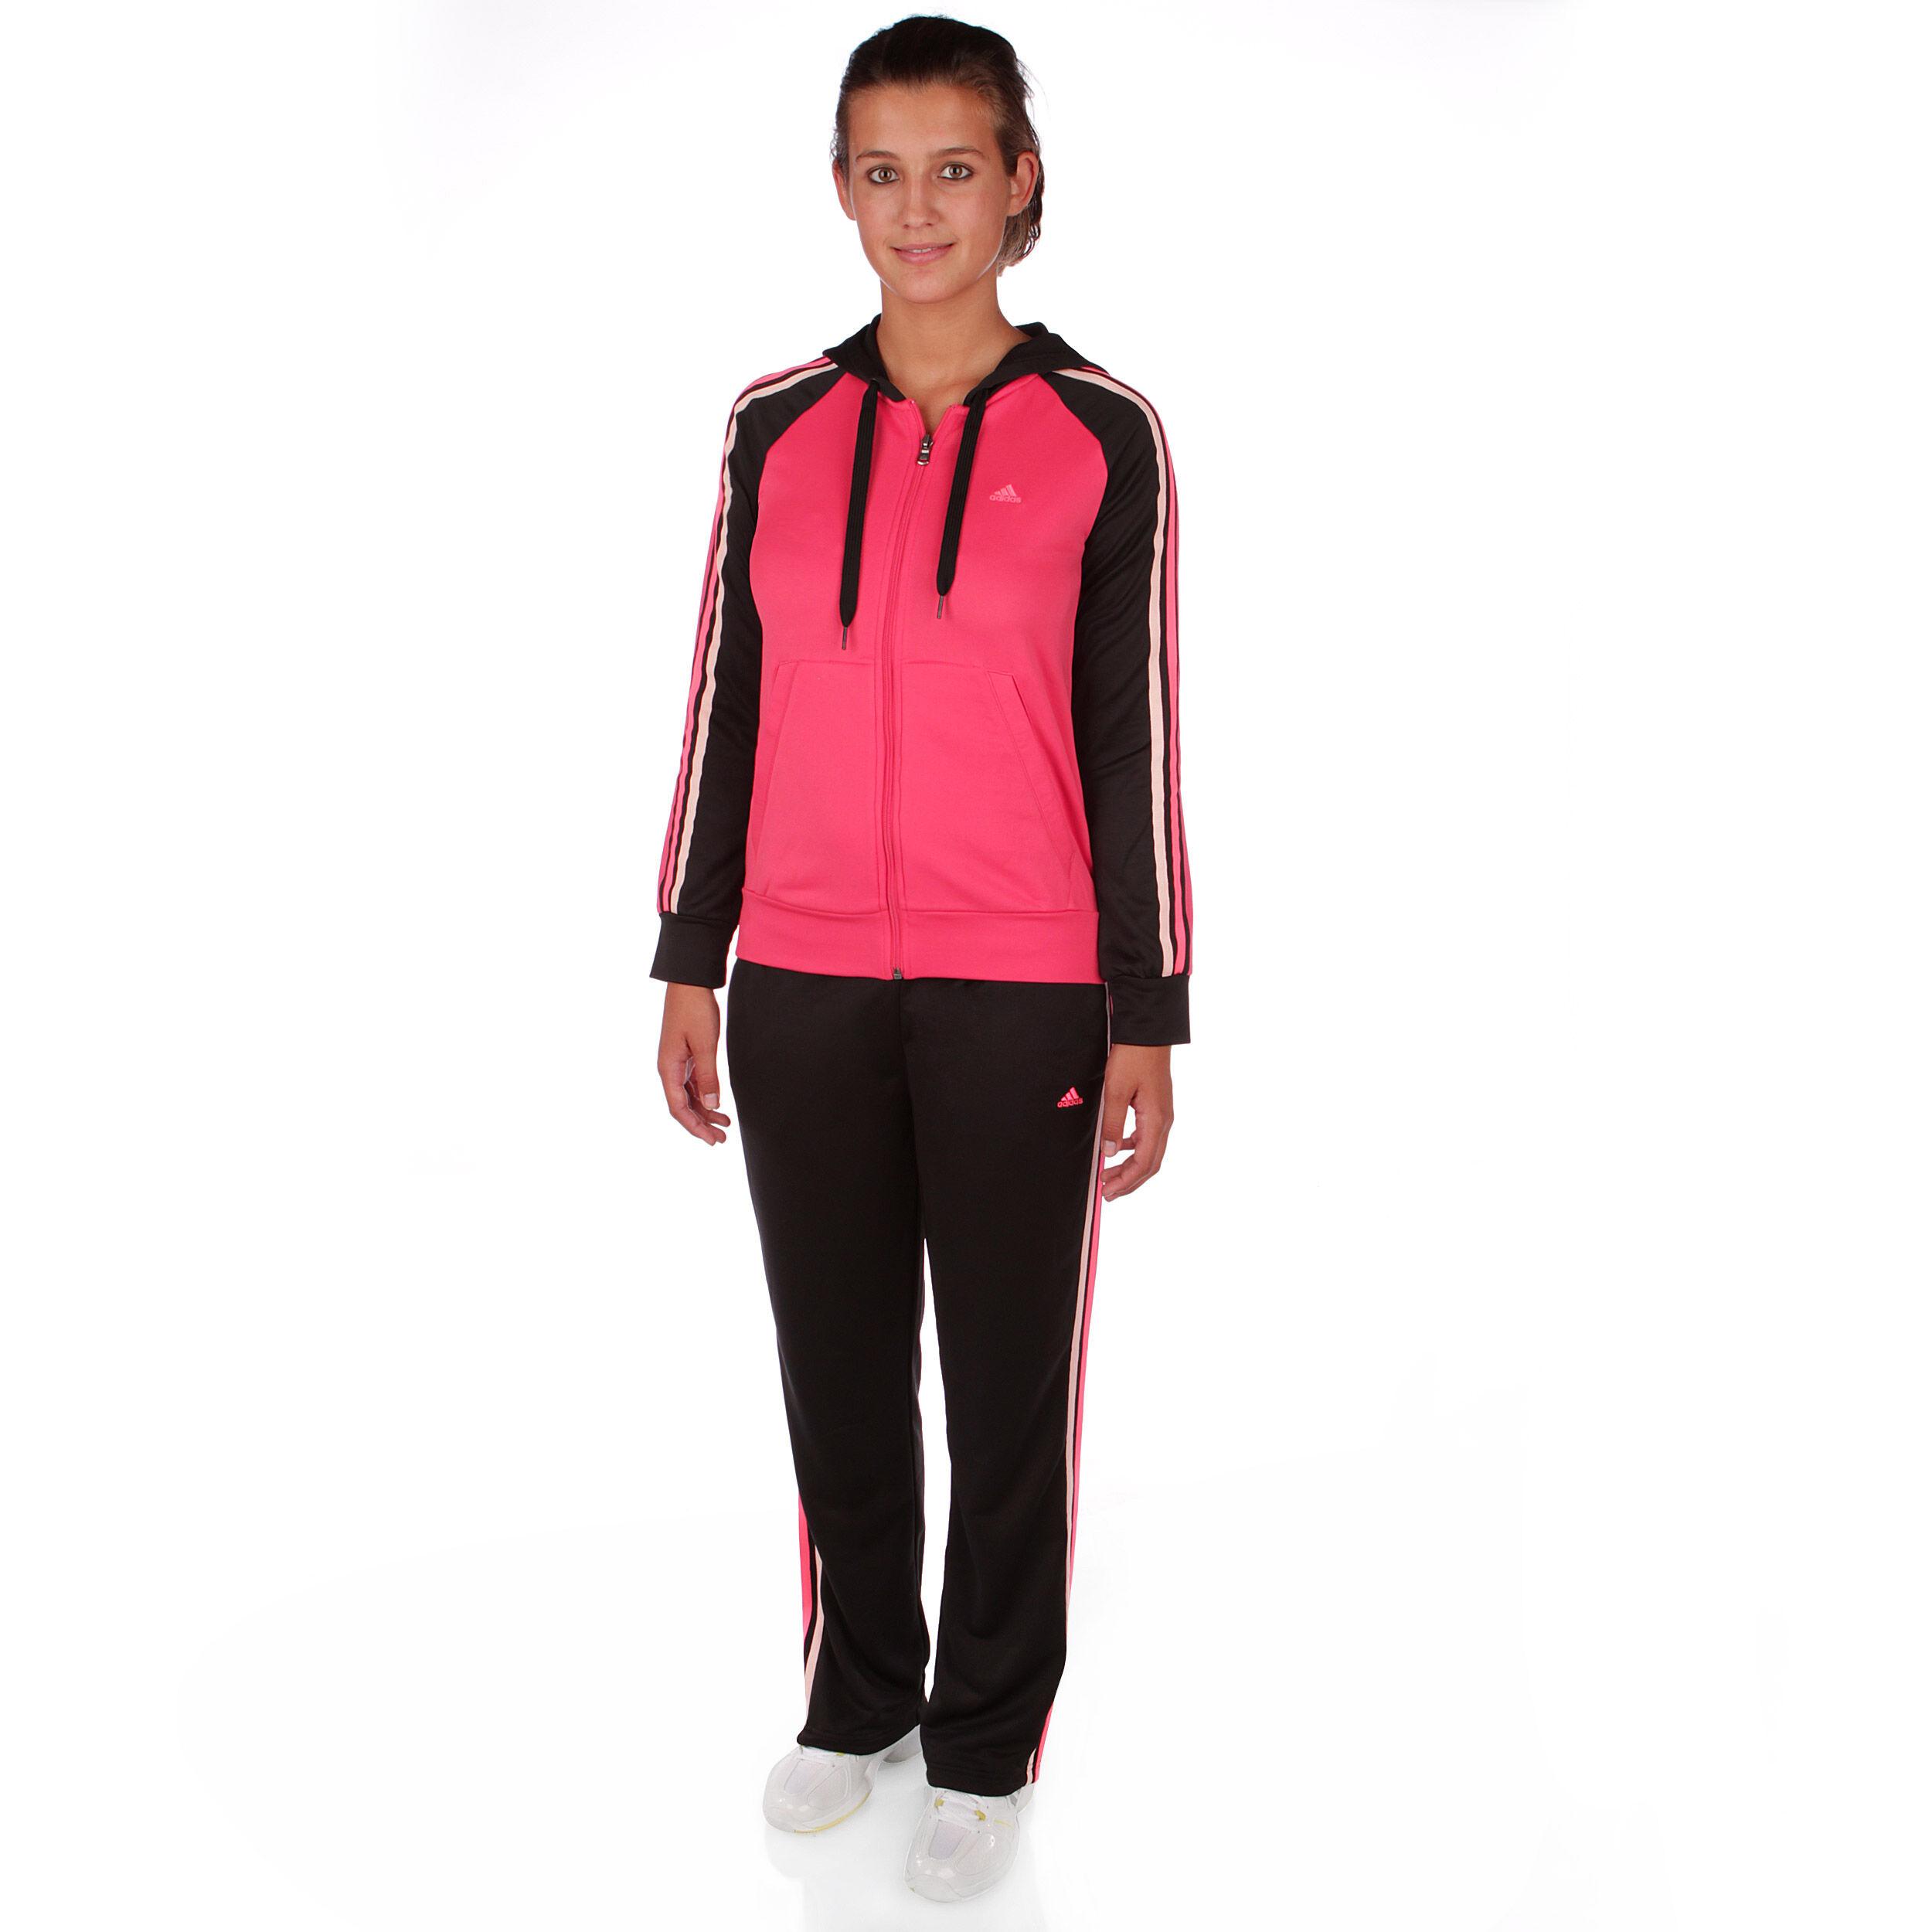 adidas Damen Fit Suit Pp Trainingsanzug